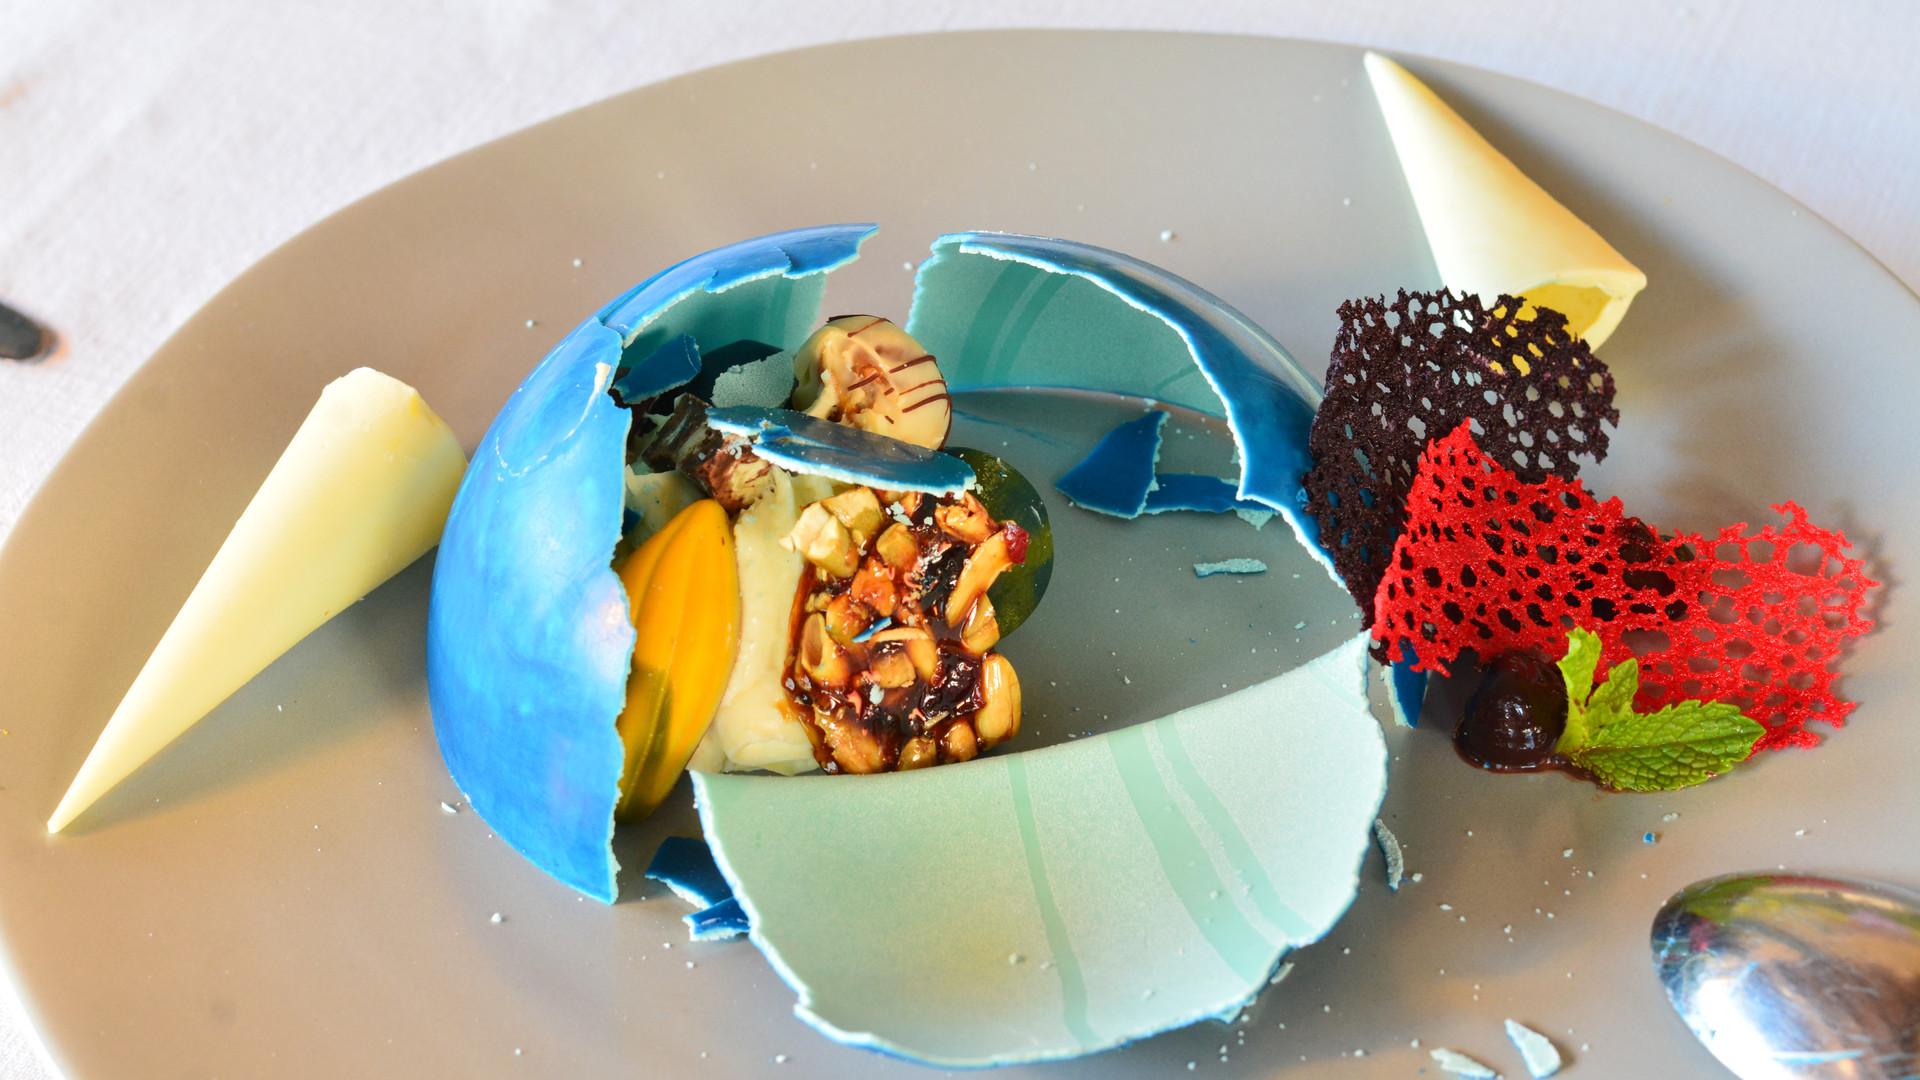 Don_Sanchez_dessert_chocolate_piñata2.J